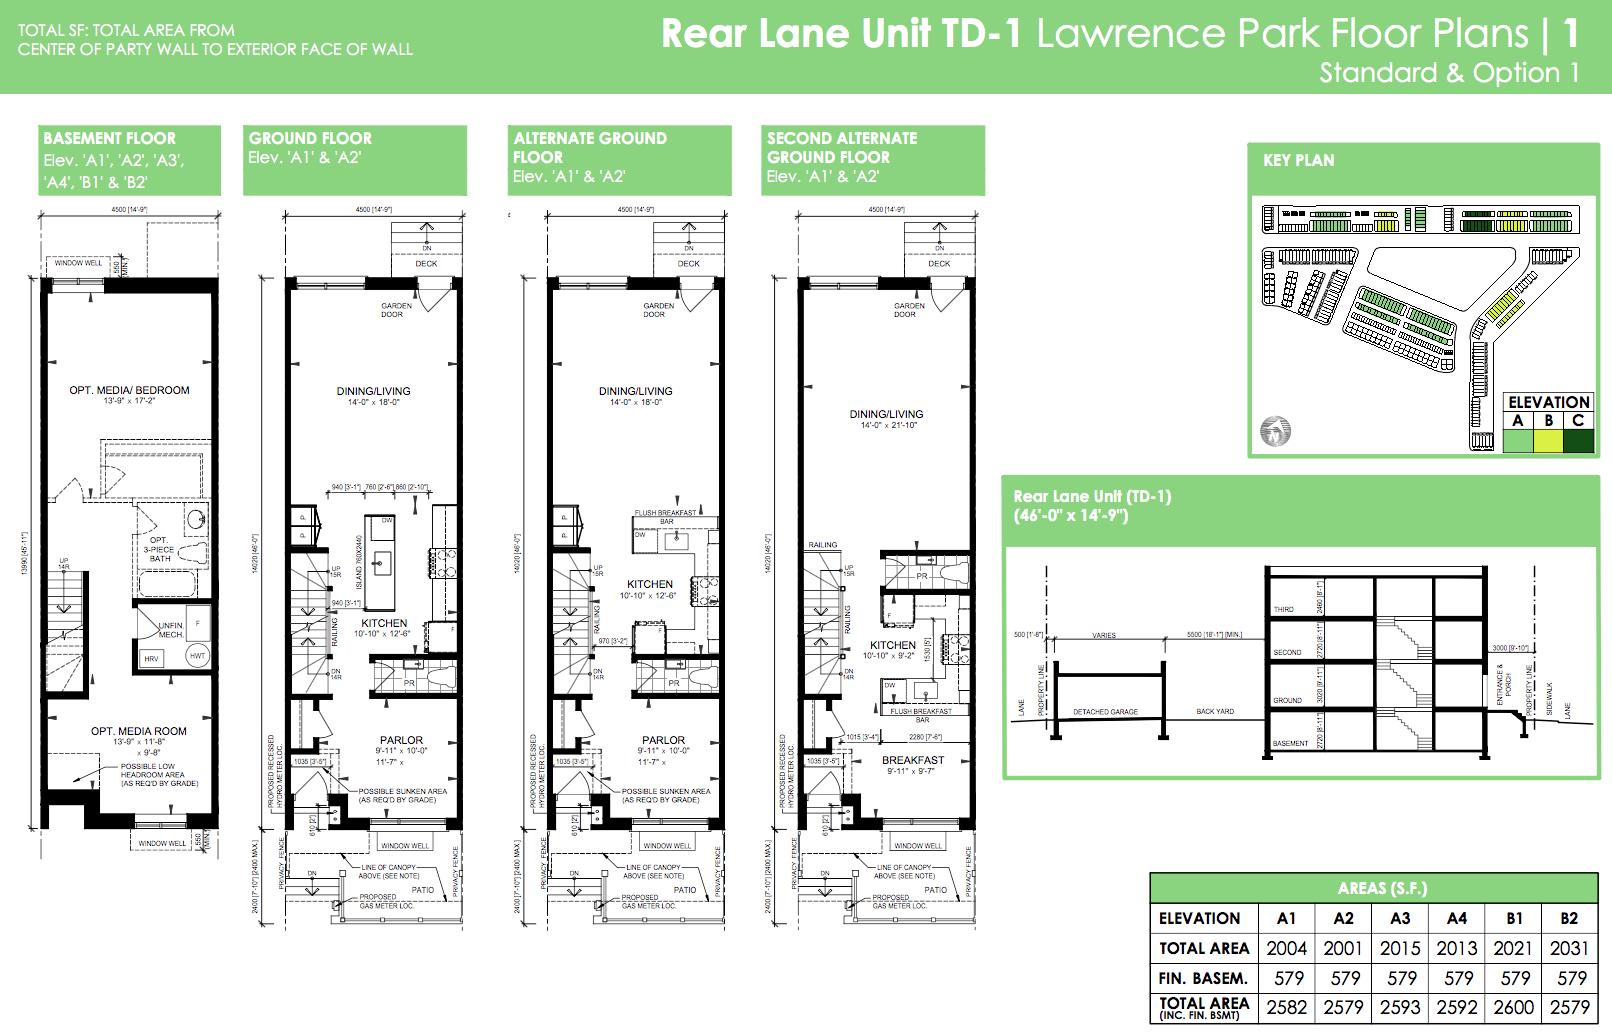 Rear Lane TD-1 Lawrence Park Floor Plan